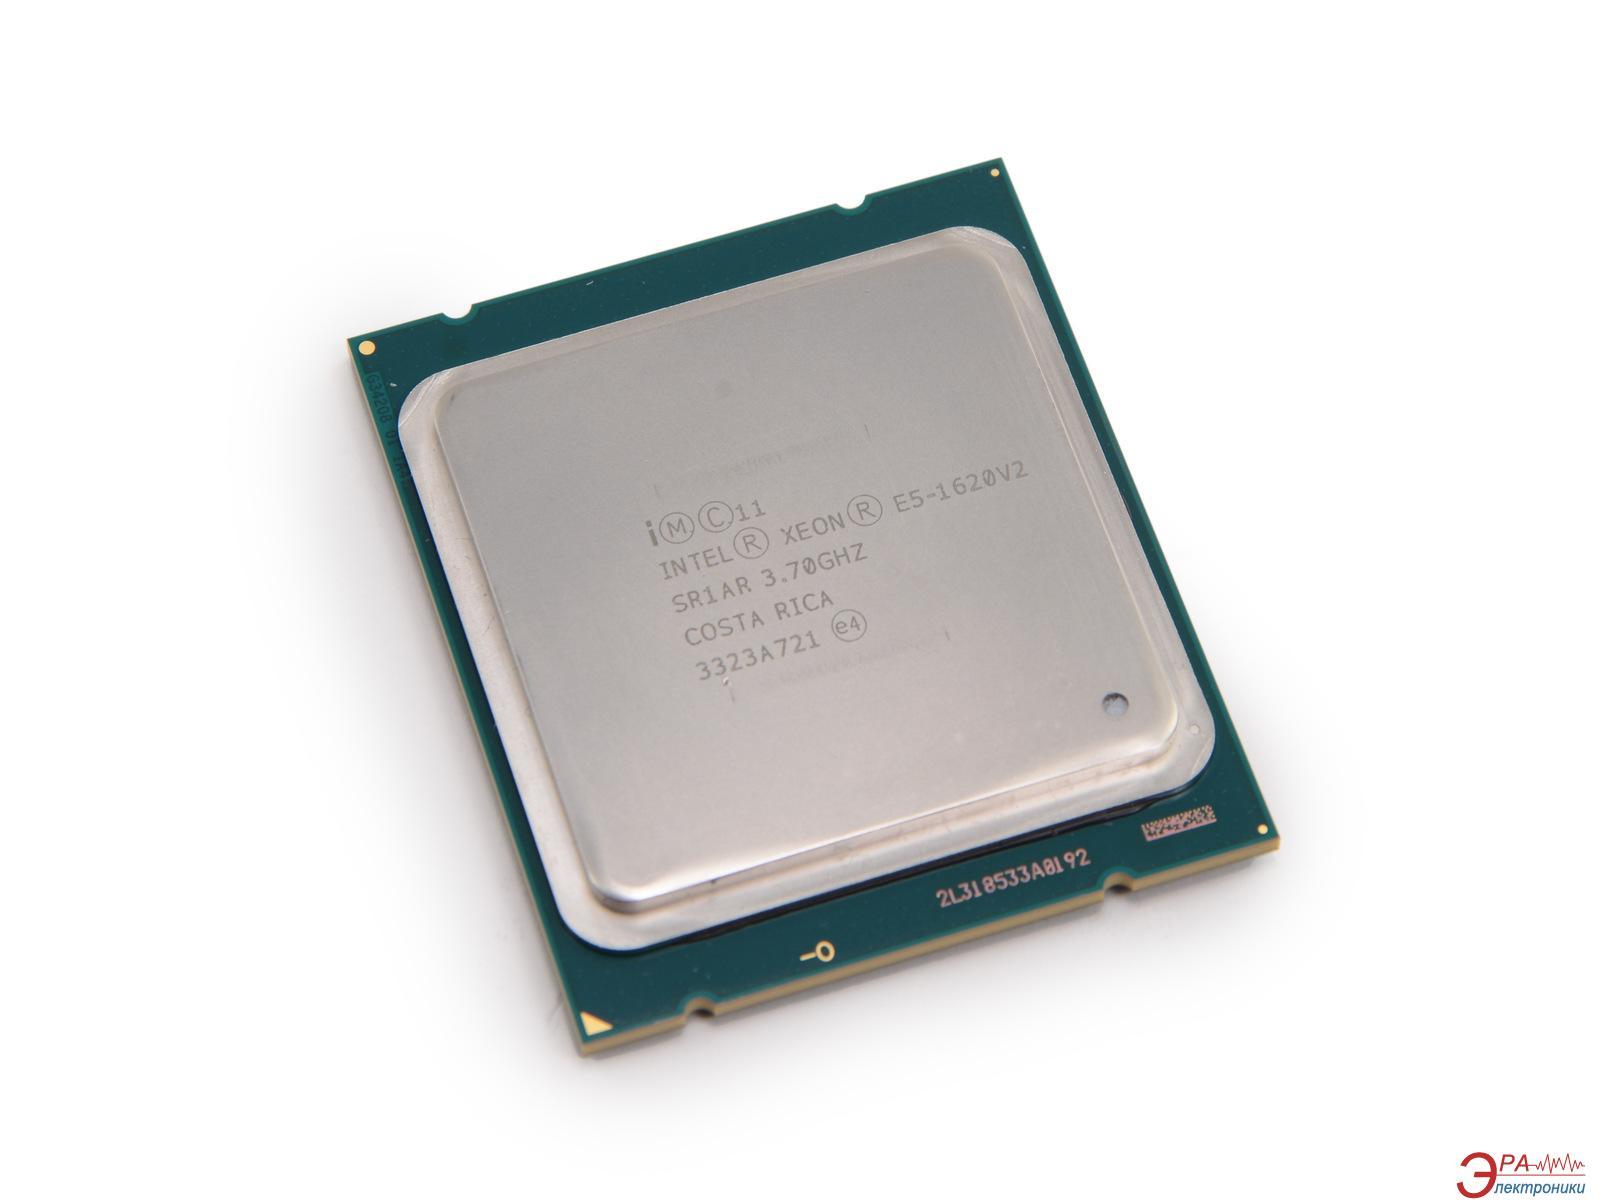 Серверный процессор Intel Xeon E5-1620V2 (CM8063501292405) Tray